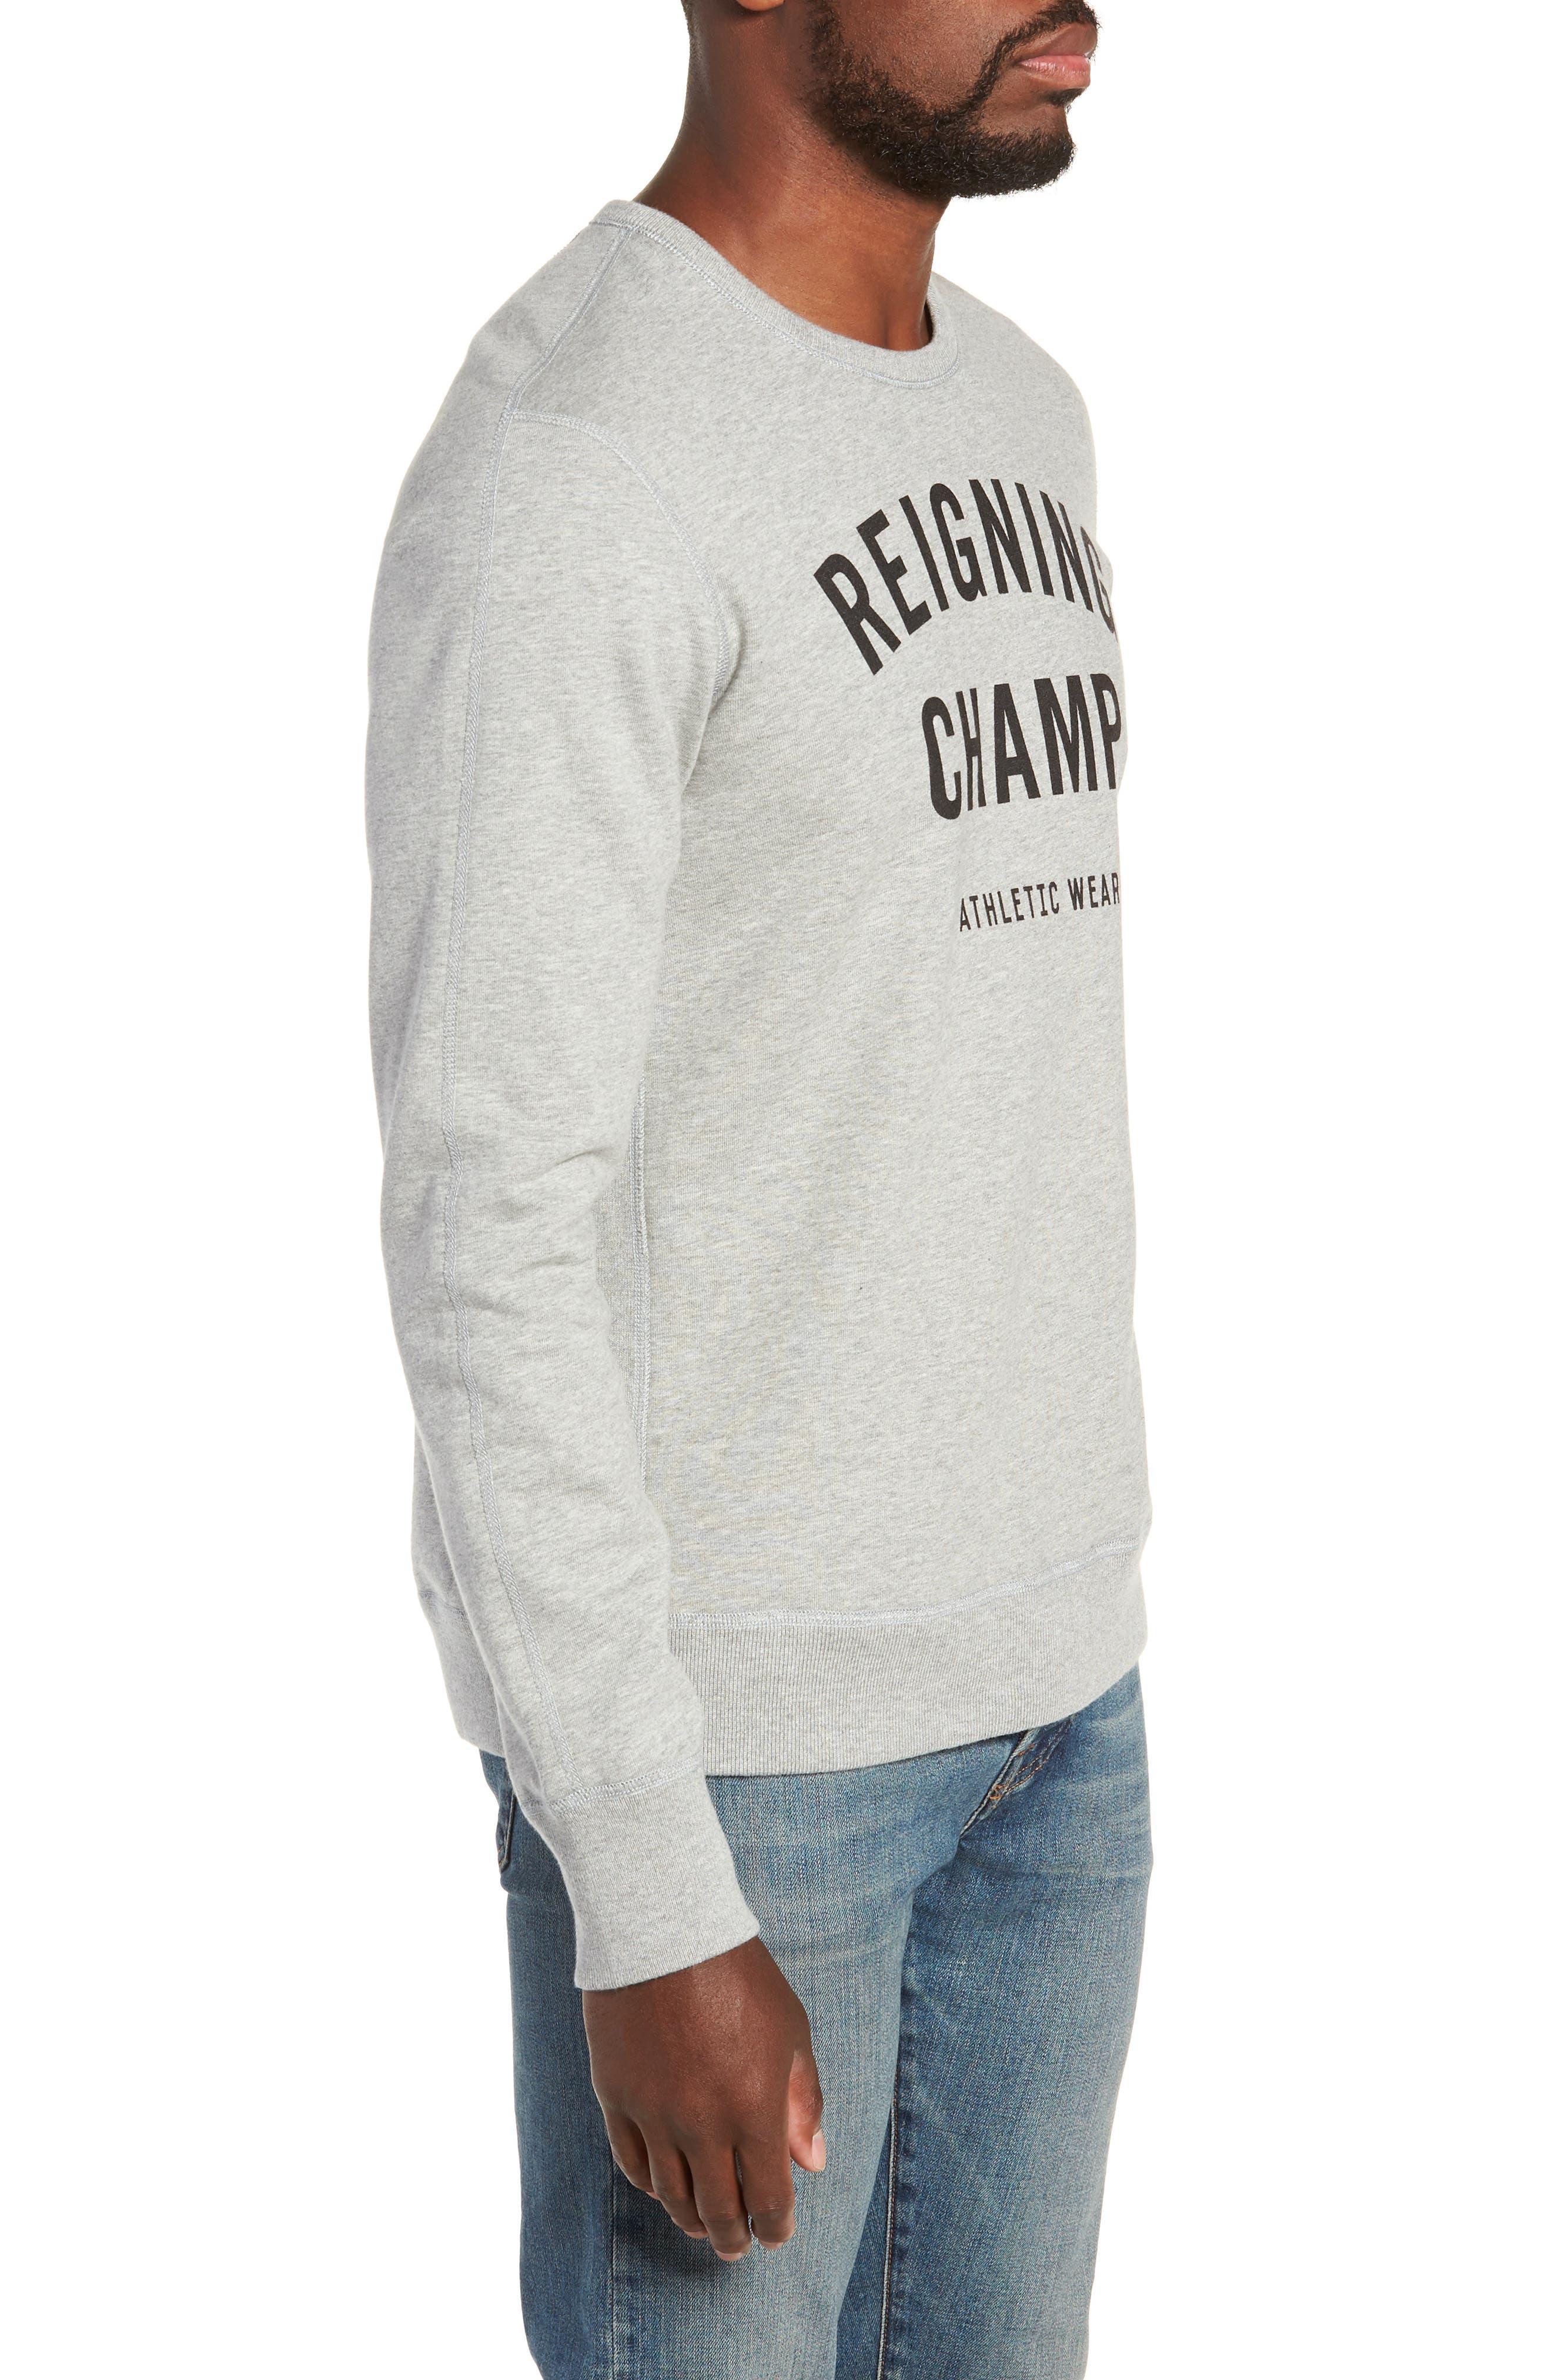 REIGNING CHAMP, Gym Logo Sweatshirt, Alternate thumbnail 3, color, HEATHER GREY/ BLACK